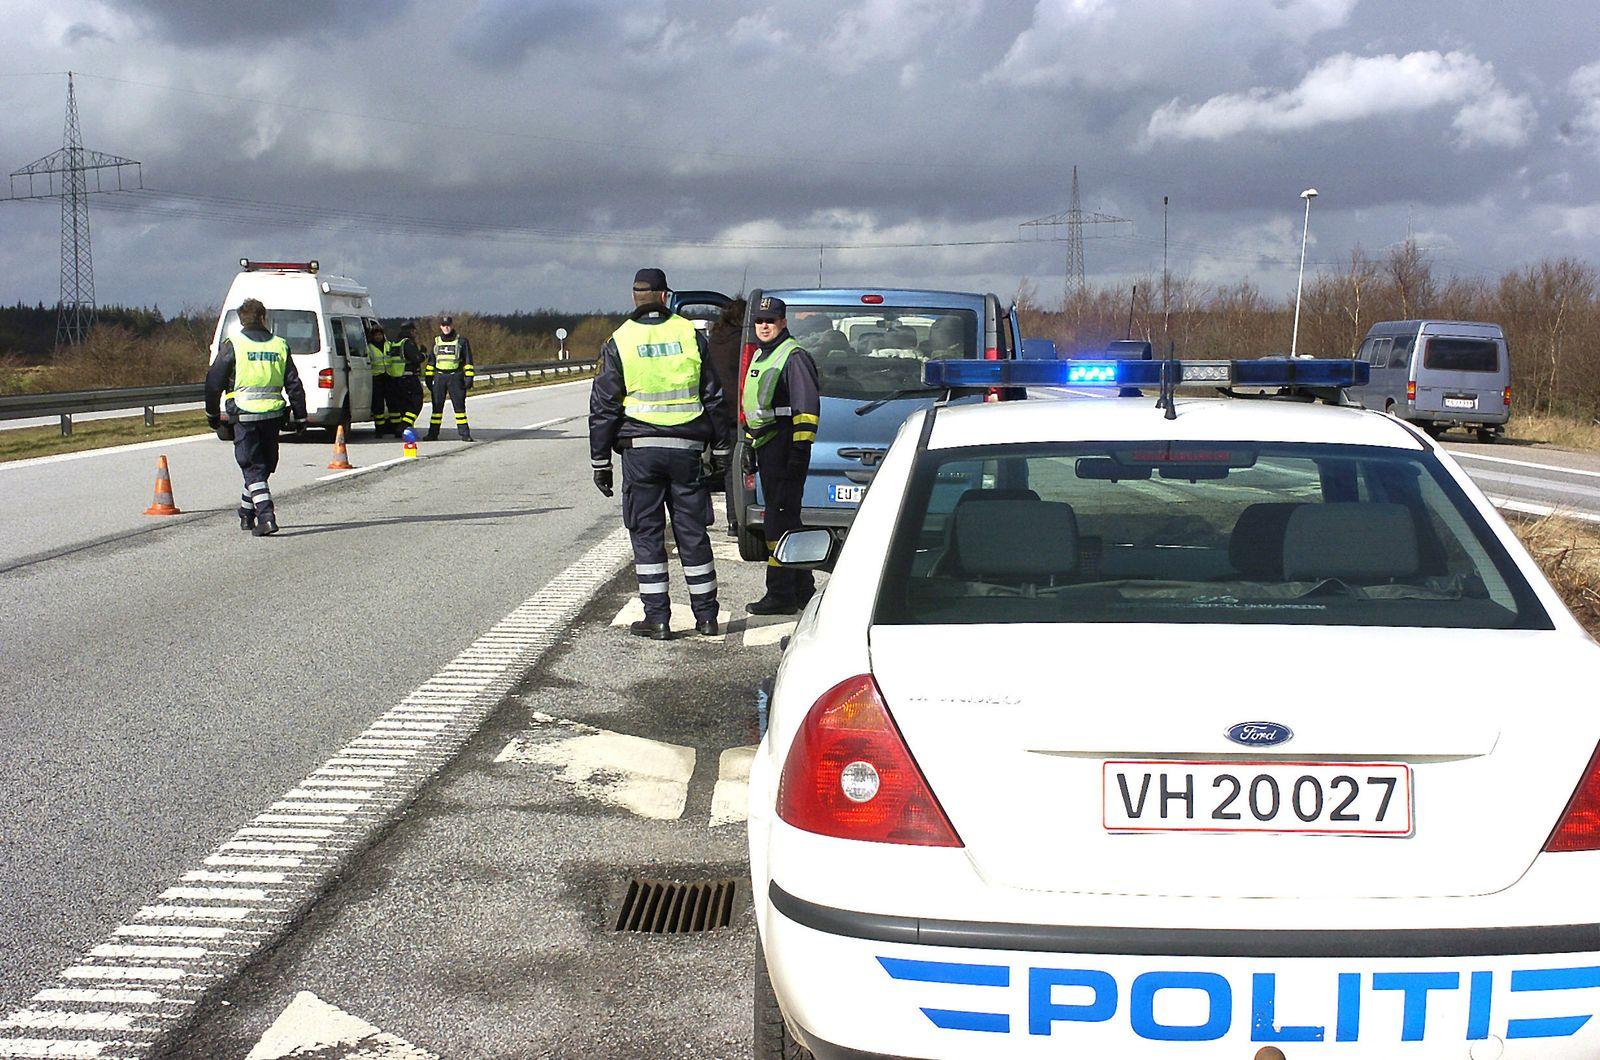 Grenzkontrolle Dänemark 2007